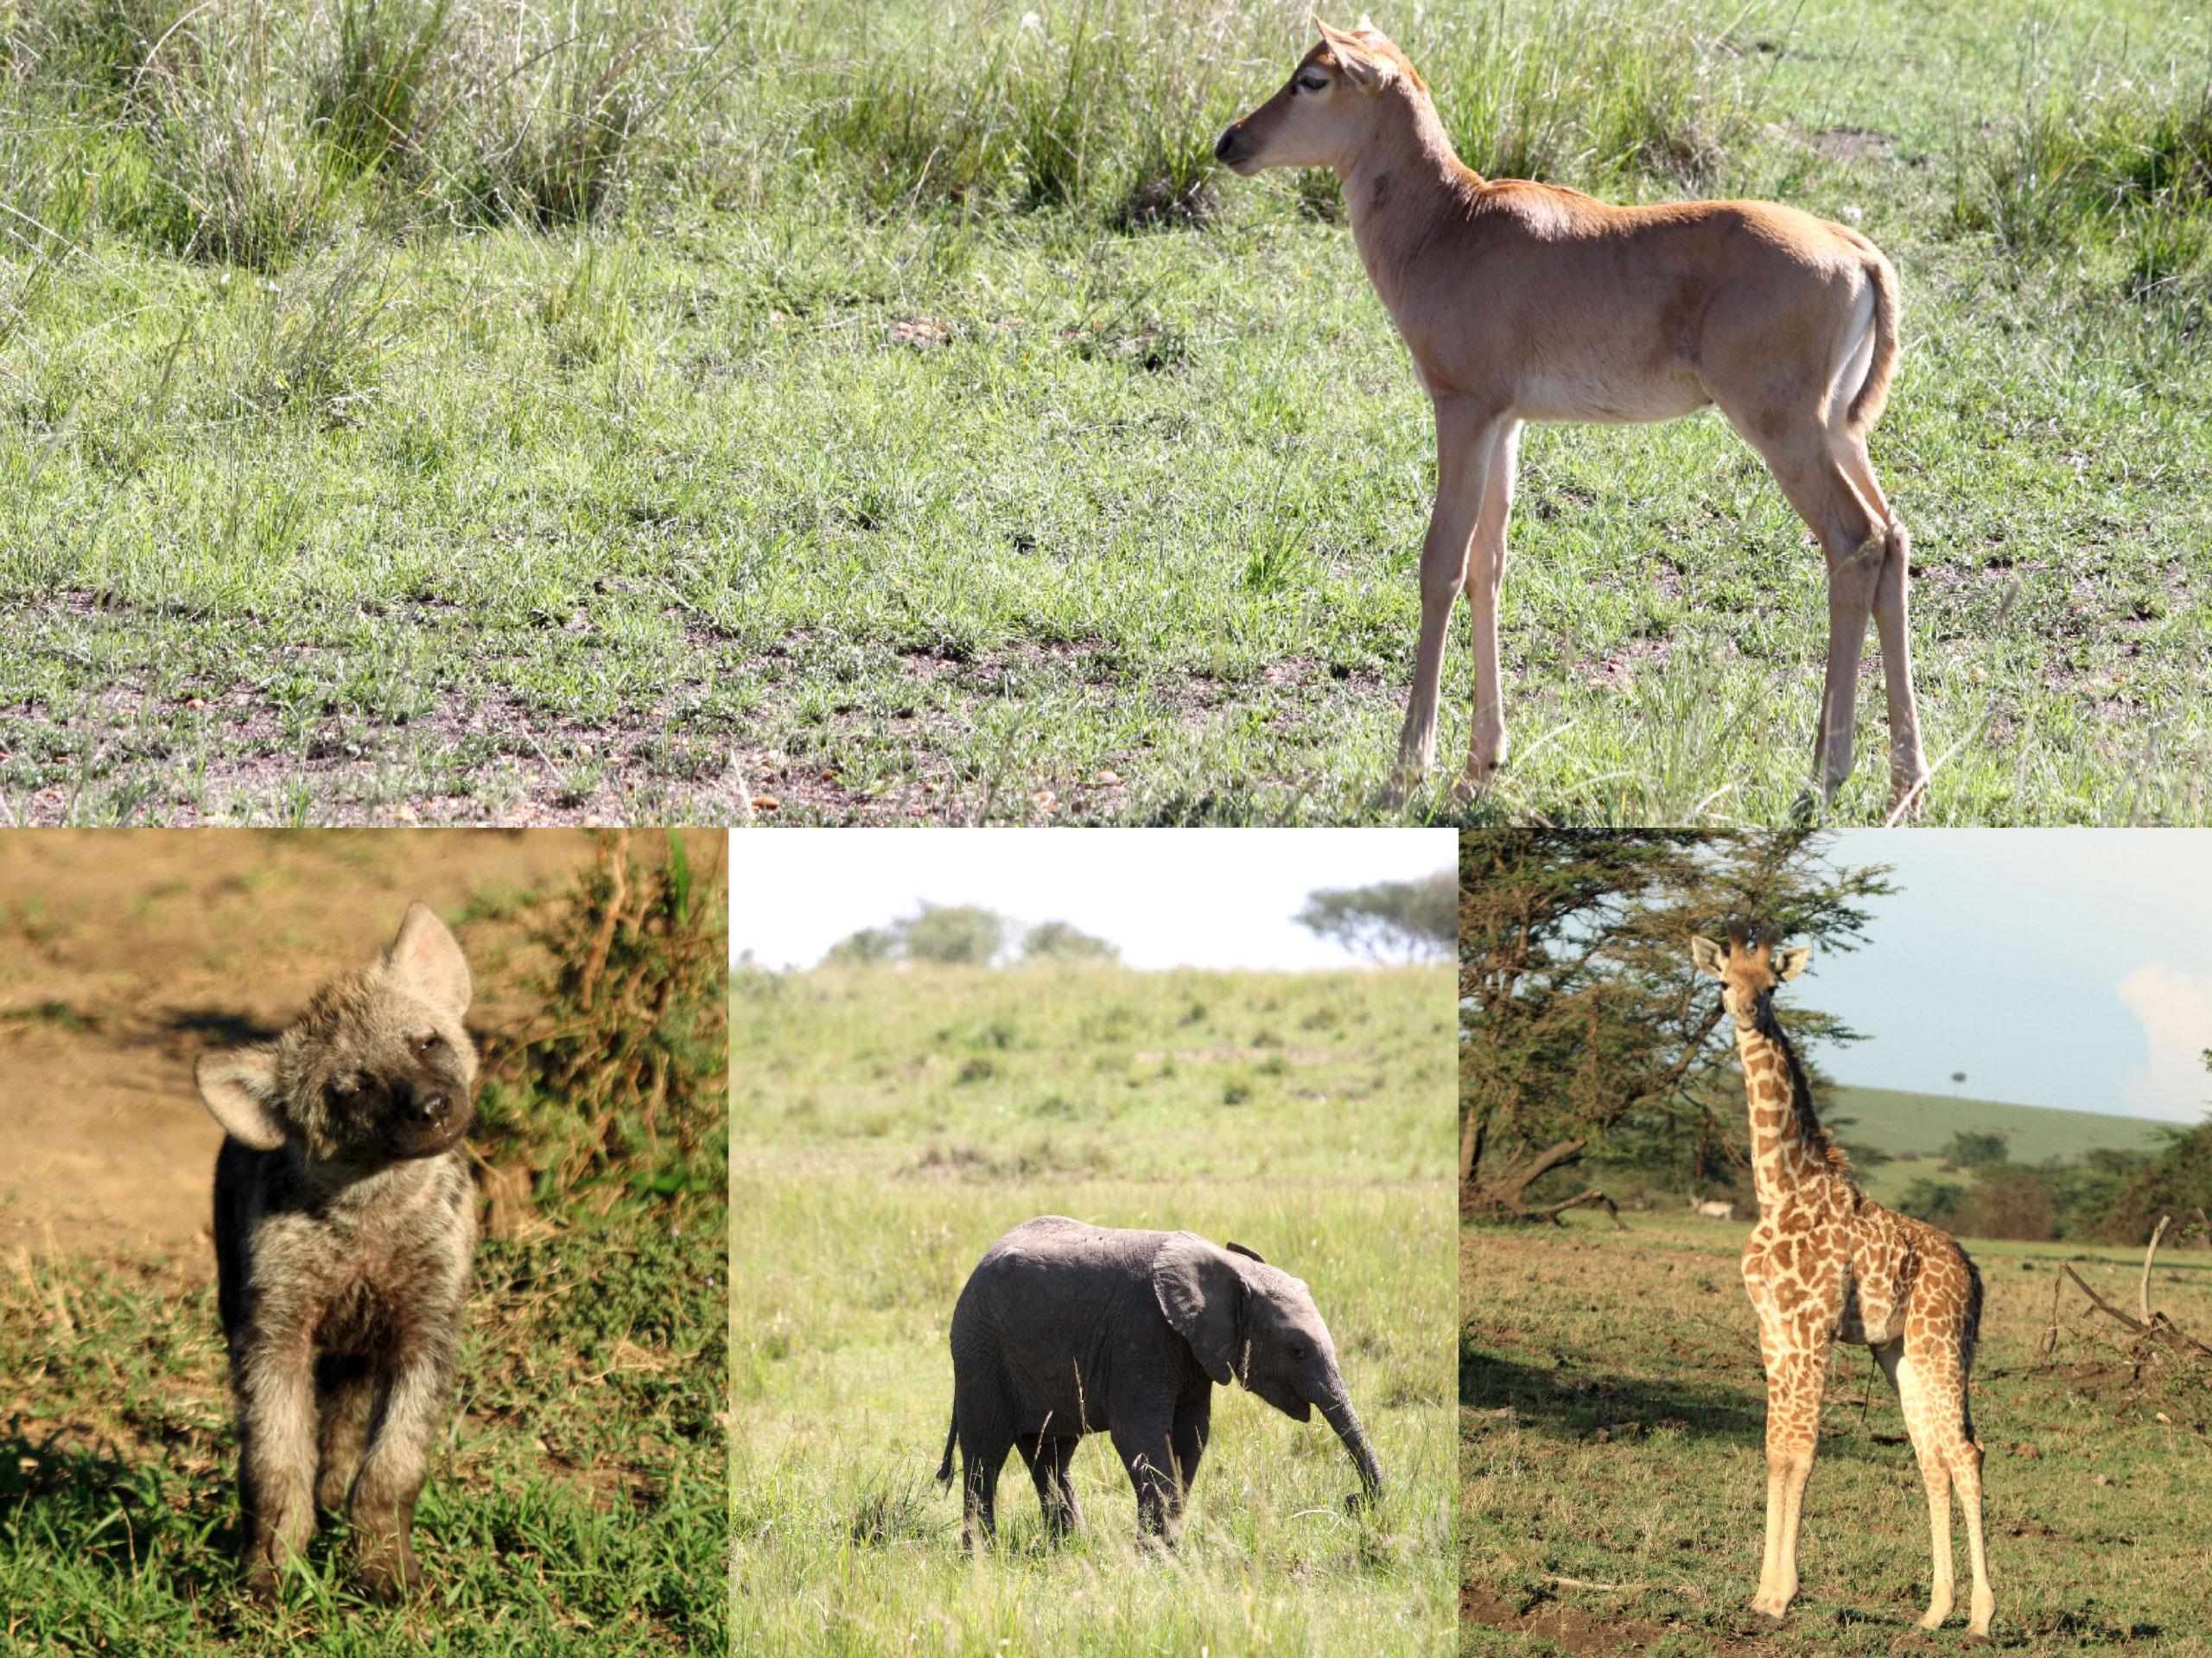 safari estación lluvias enkosi africa masai mara kenya baby elephant hyena giraffe hartebeest